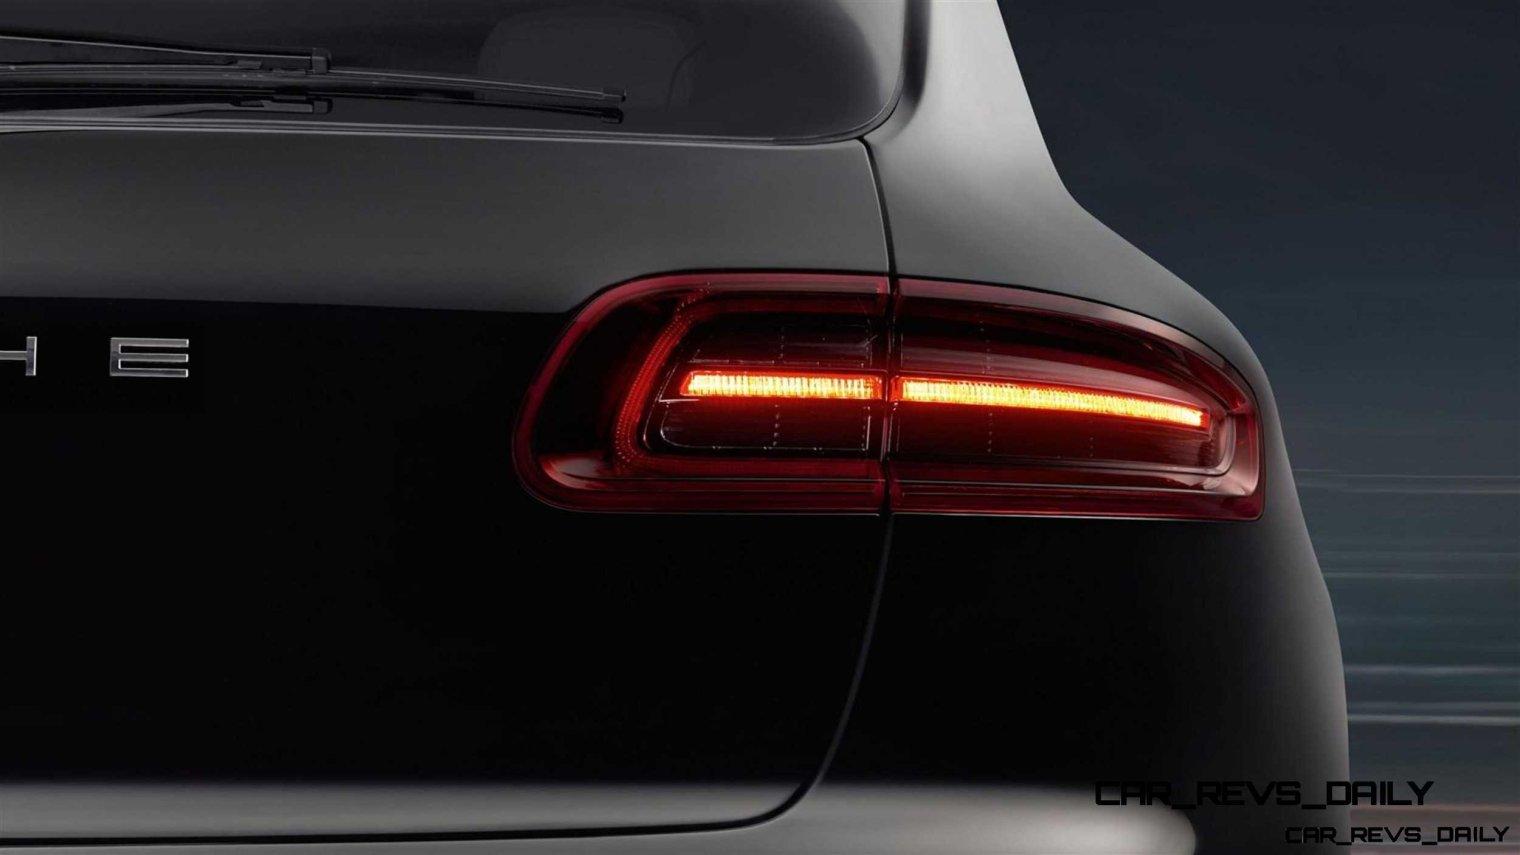 2015 Porsche Macan - Latest Images - CarRevsDaily.com 15